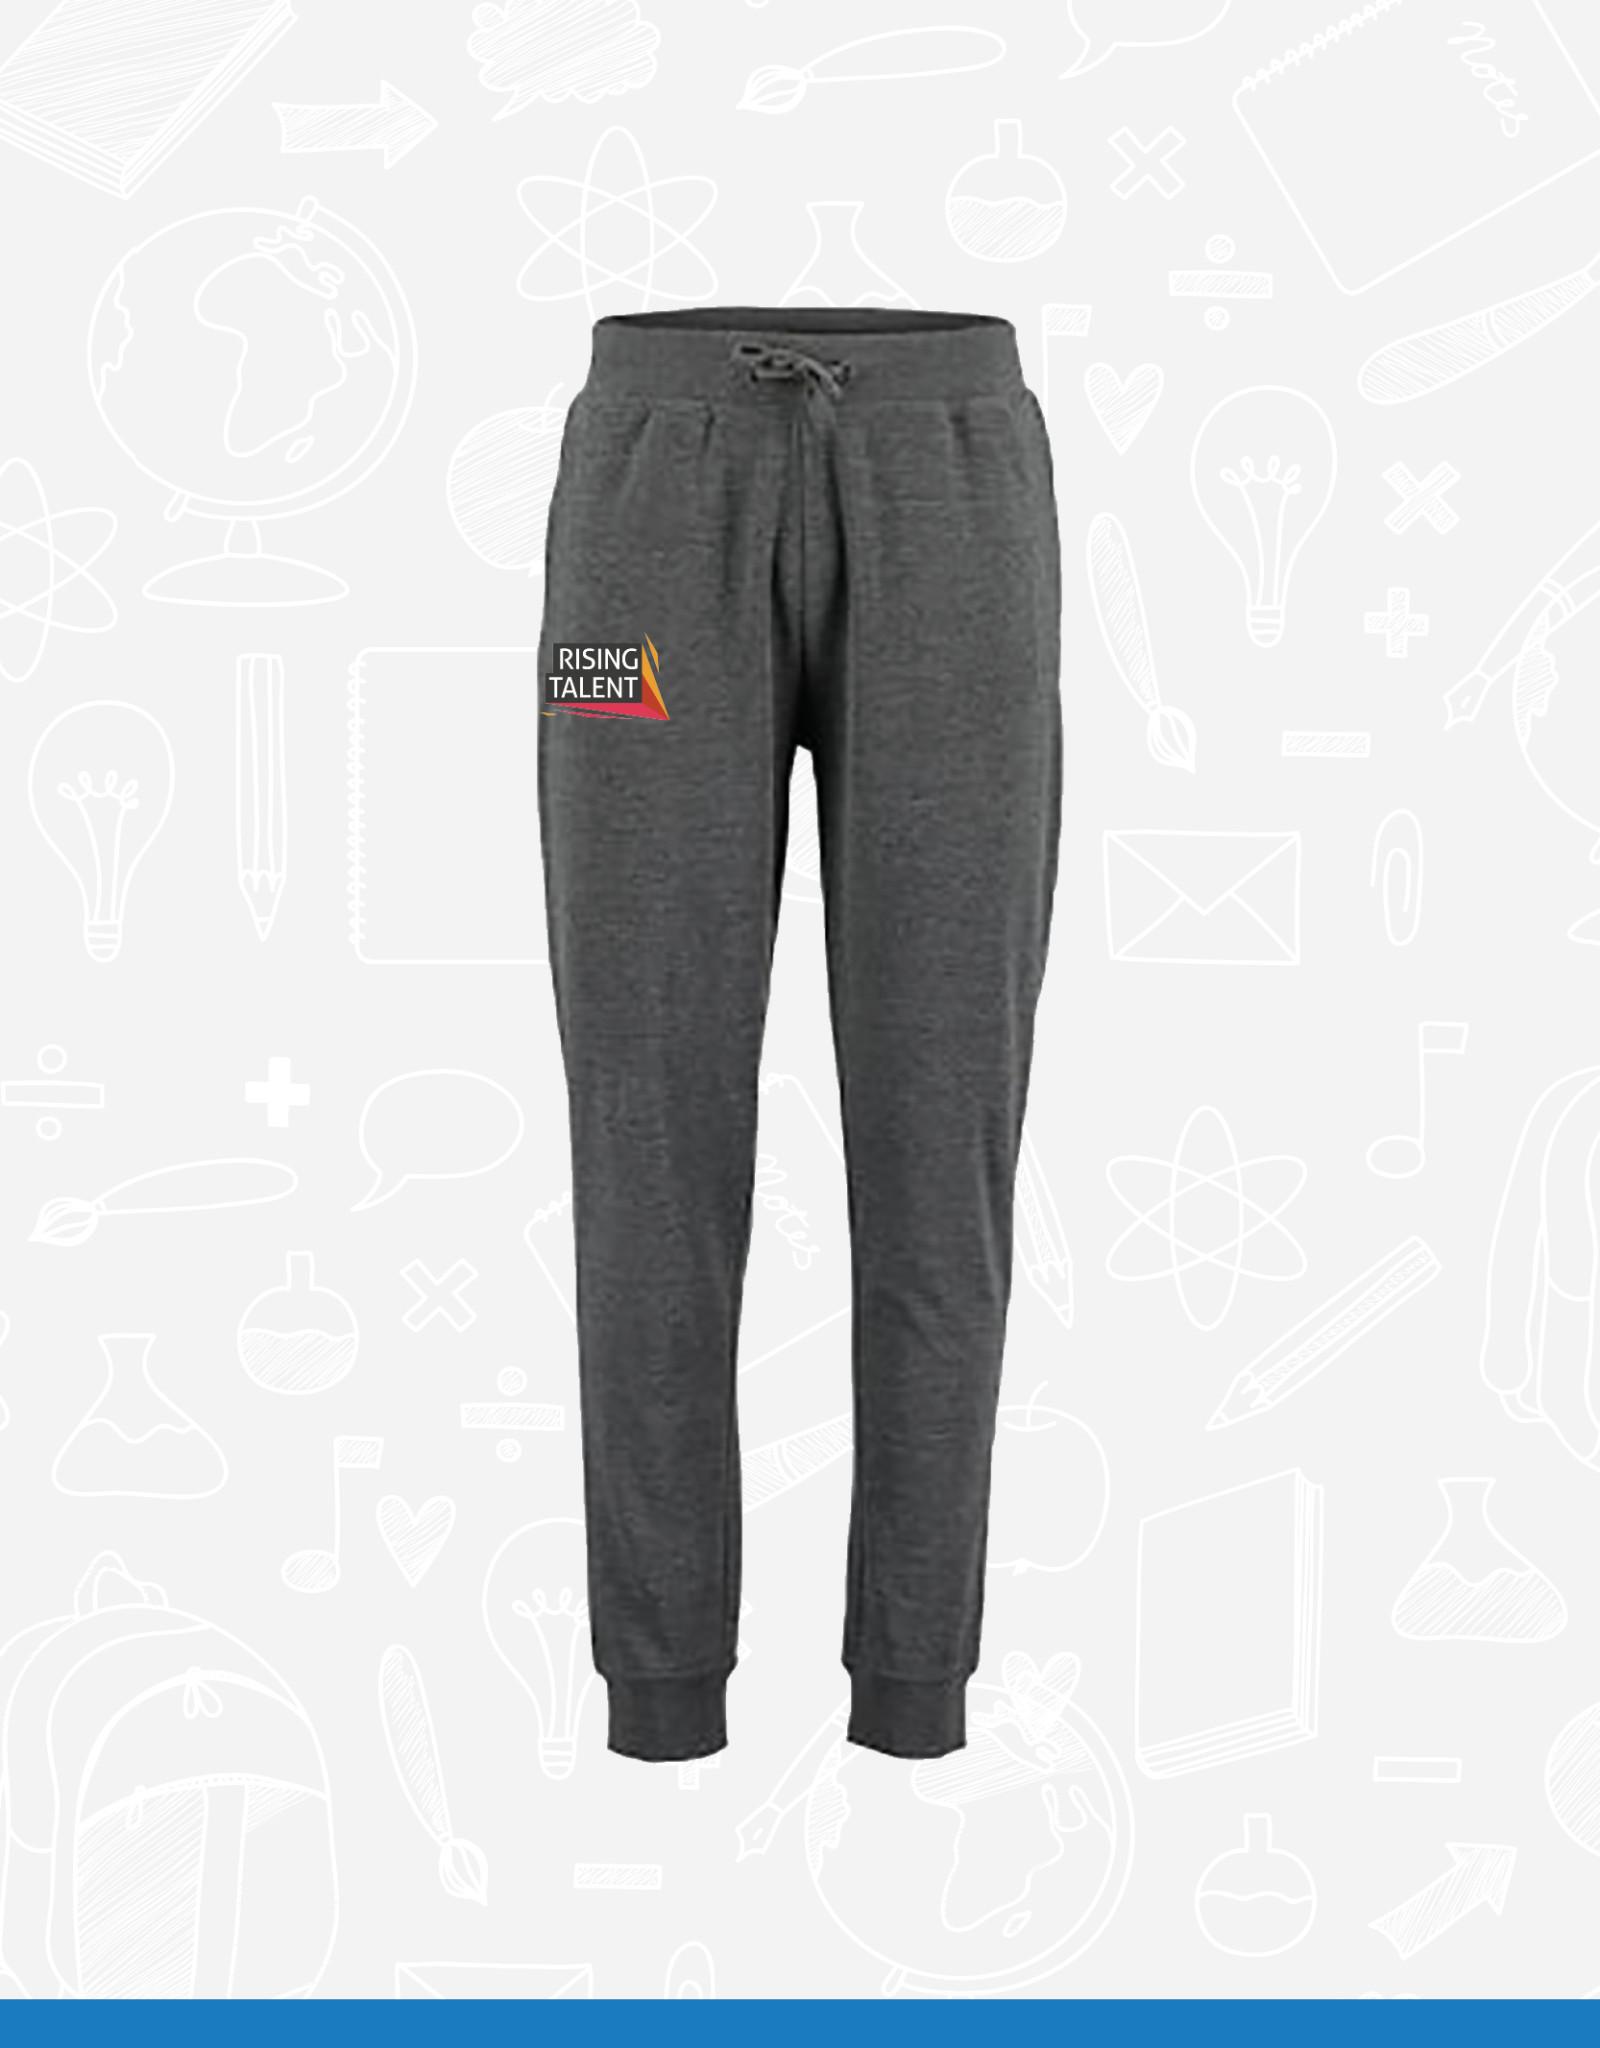 KK Rising Talent Slim Fit Sweatpants (K933)